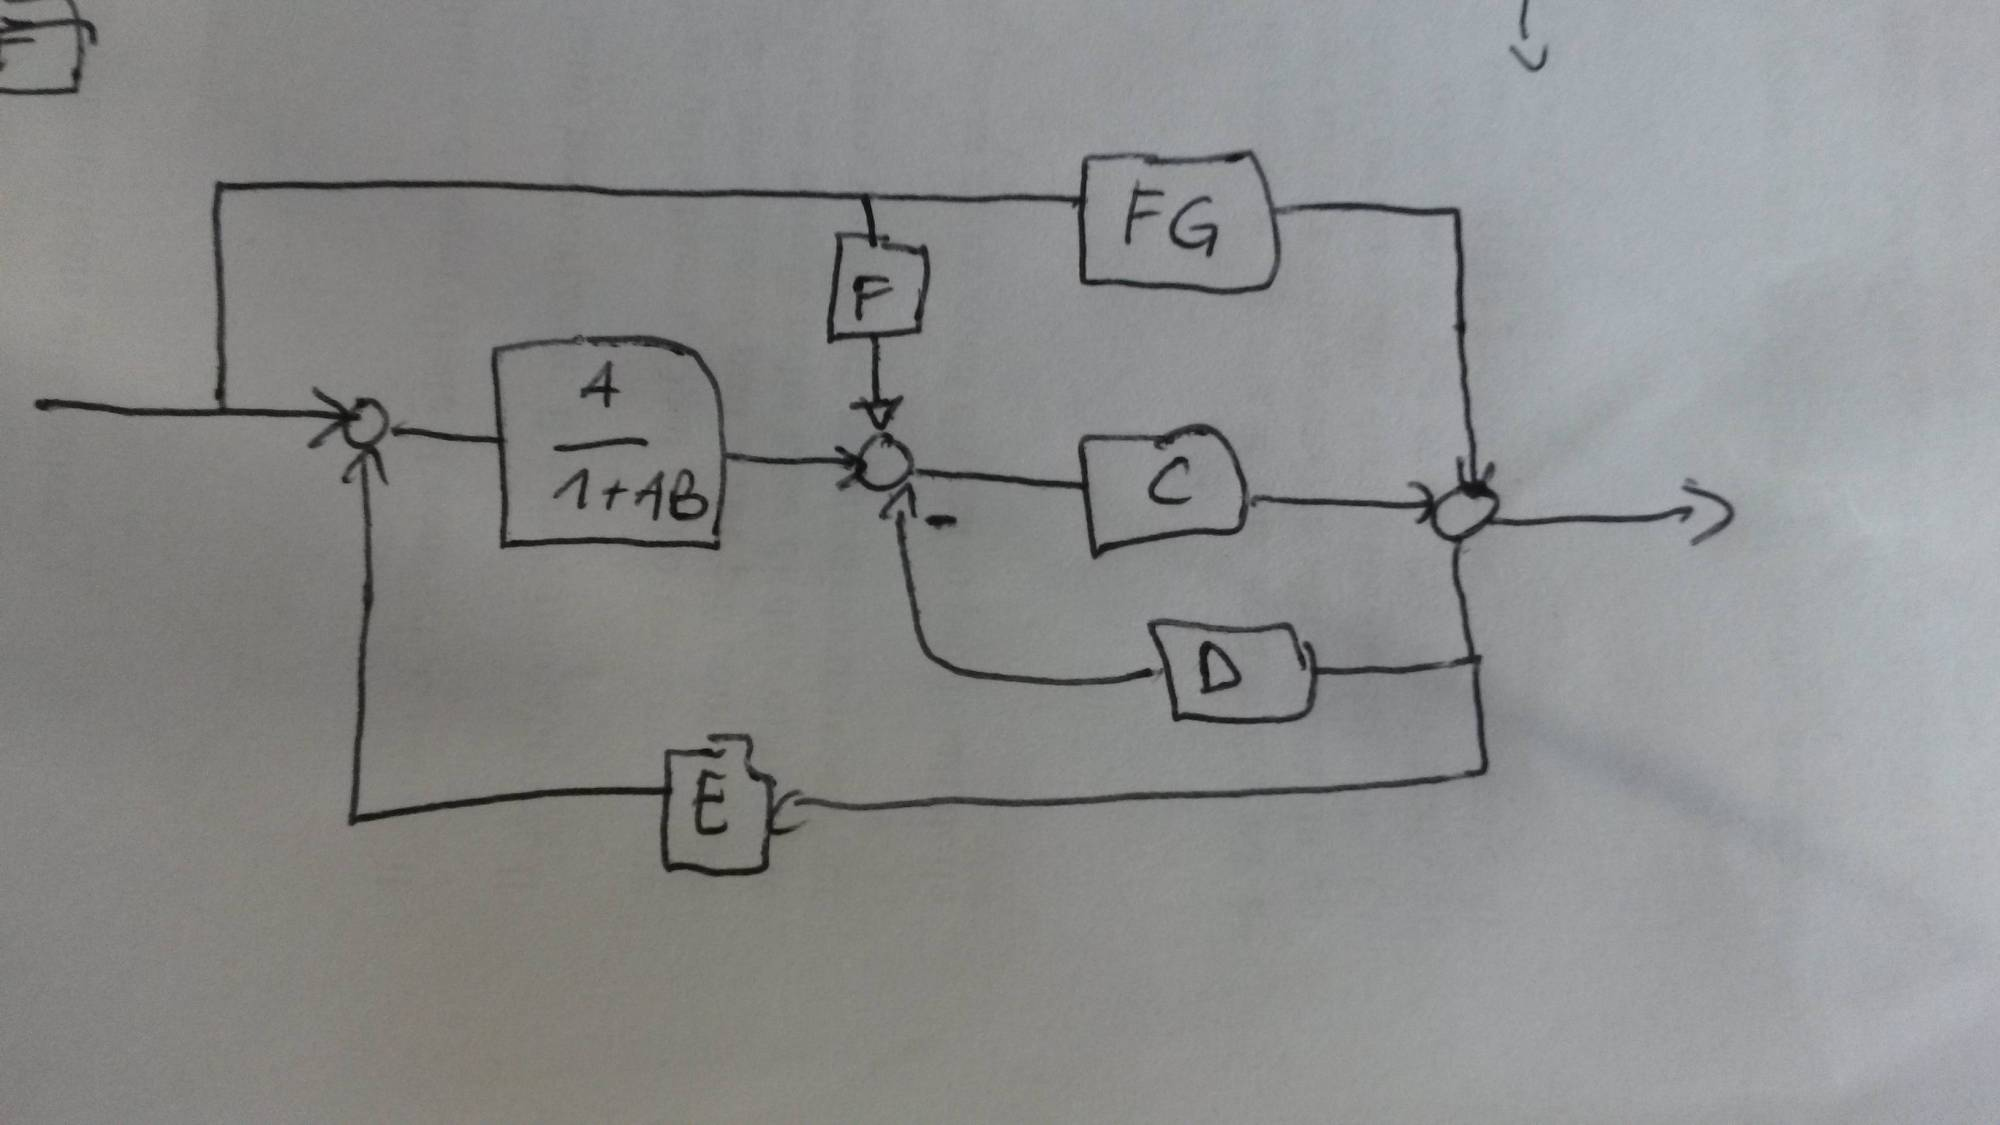 hight resolution of f g block diagram wiring diagram official f g block diagram